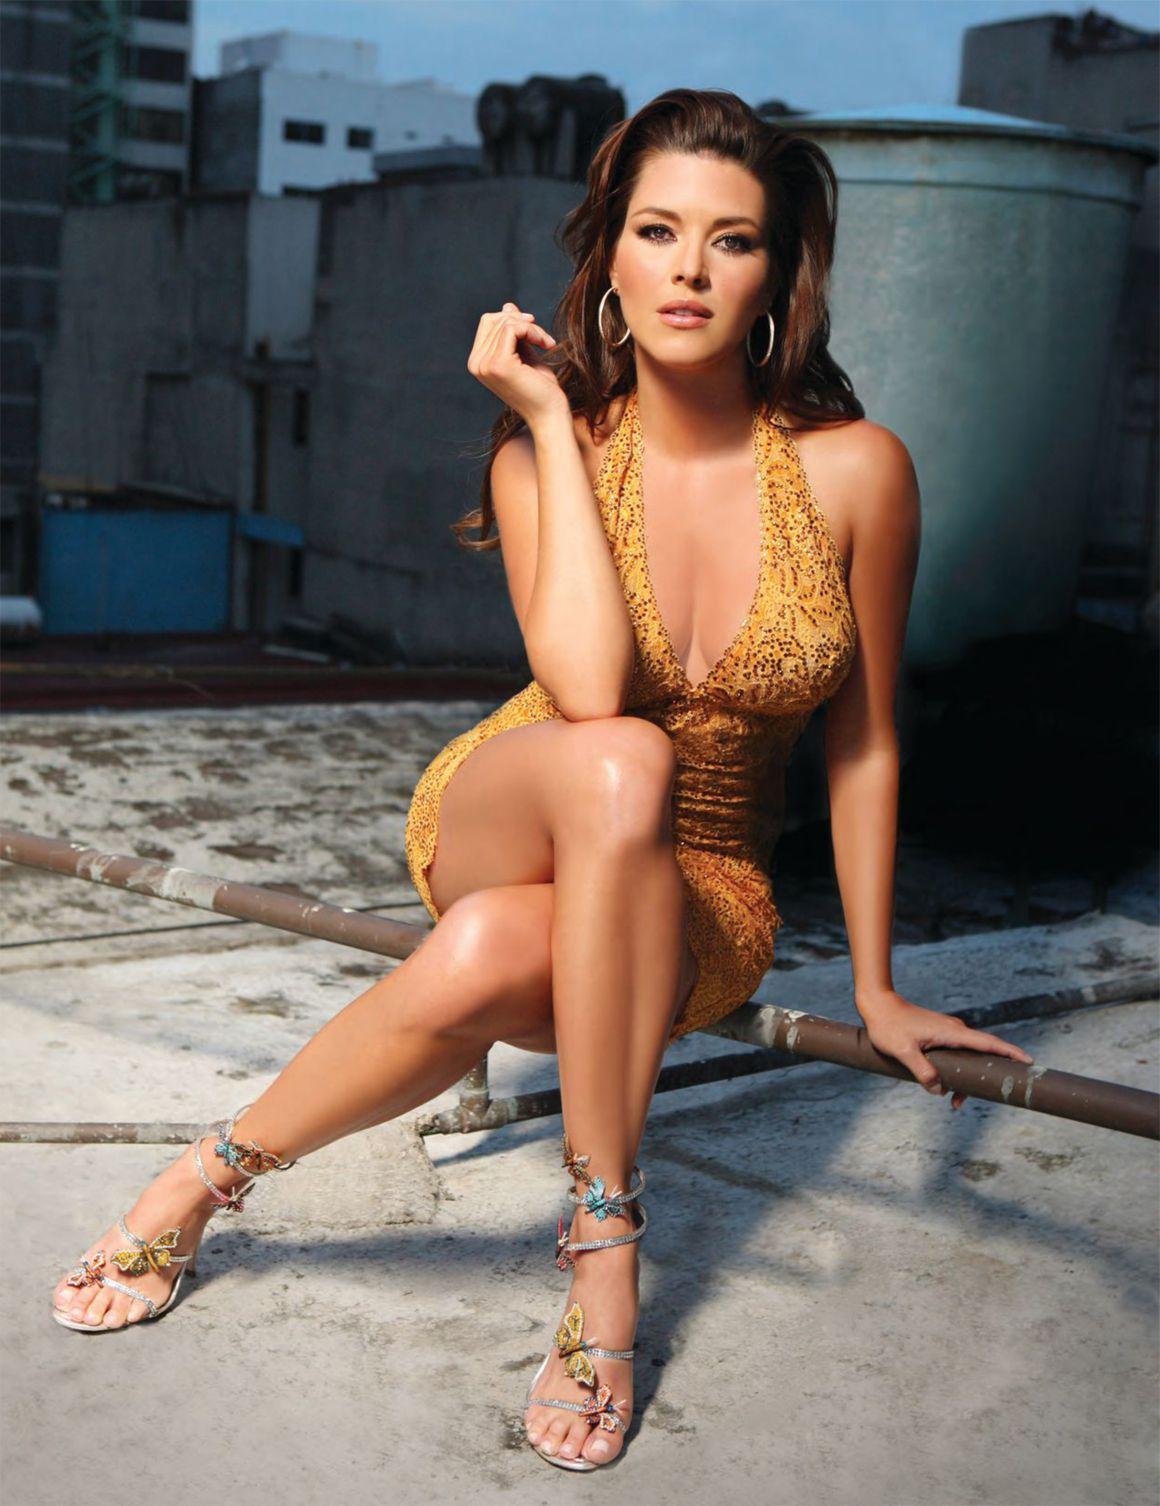 Alicia machado hot legs — photo 2